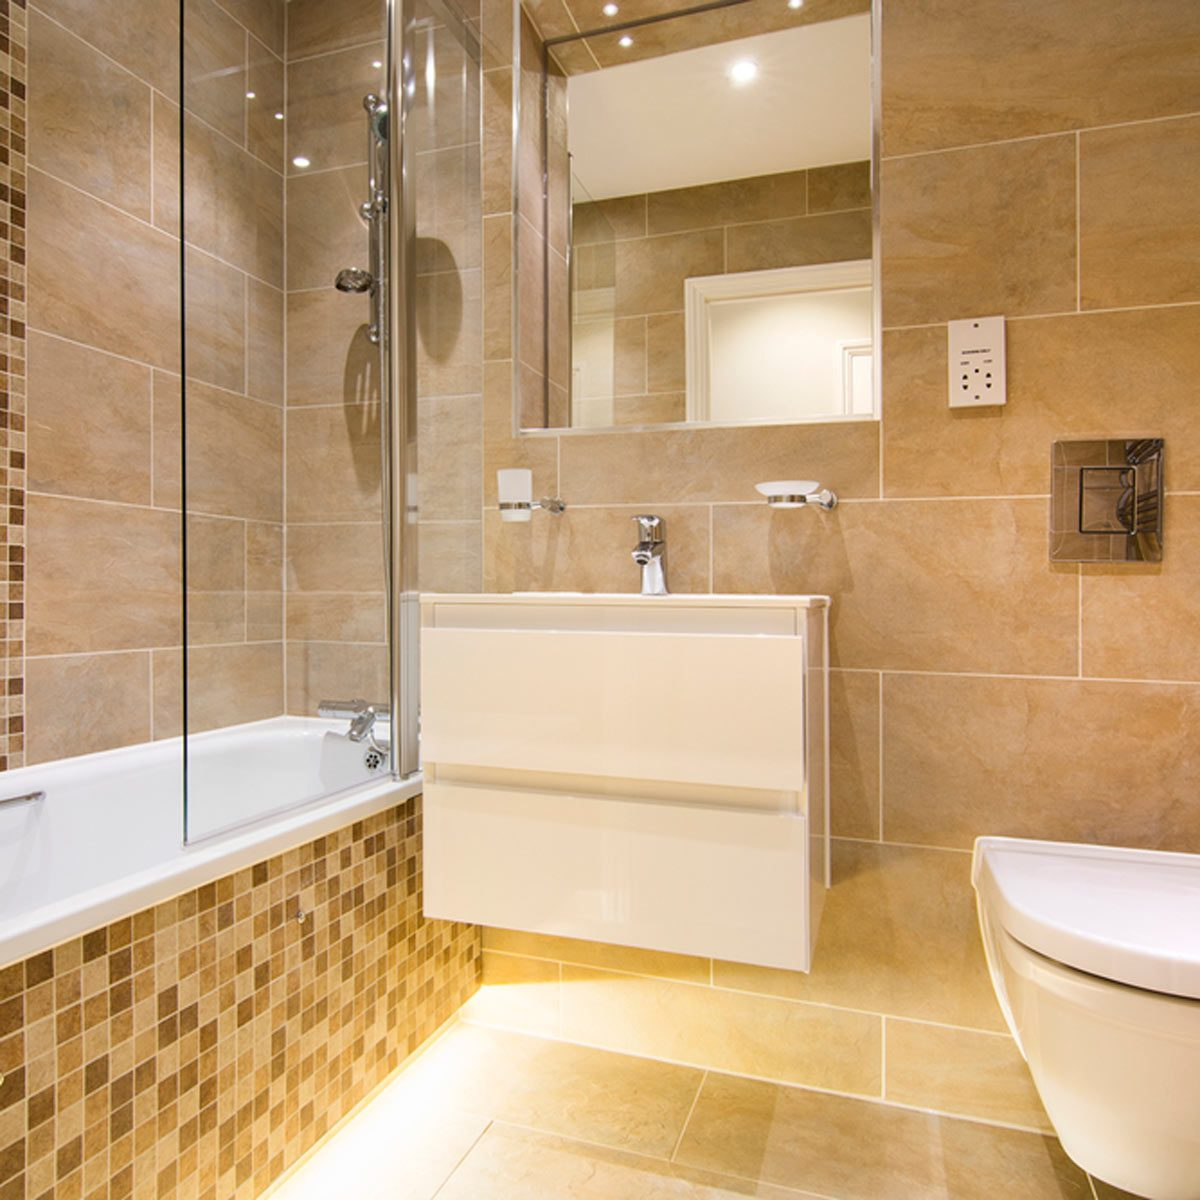 Today's Bathroom Tile Trends | Family Handyman